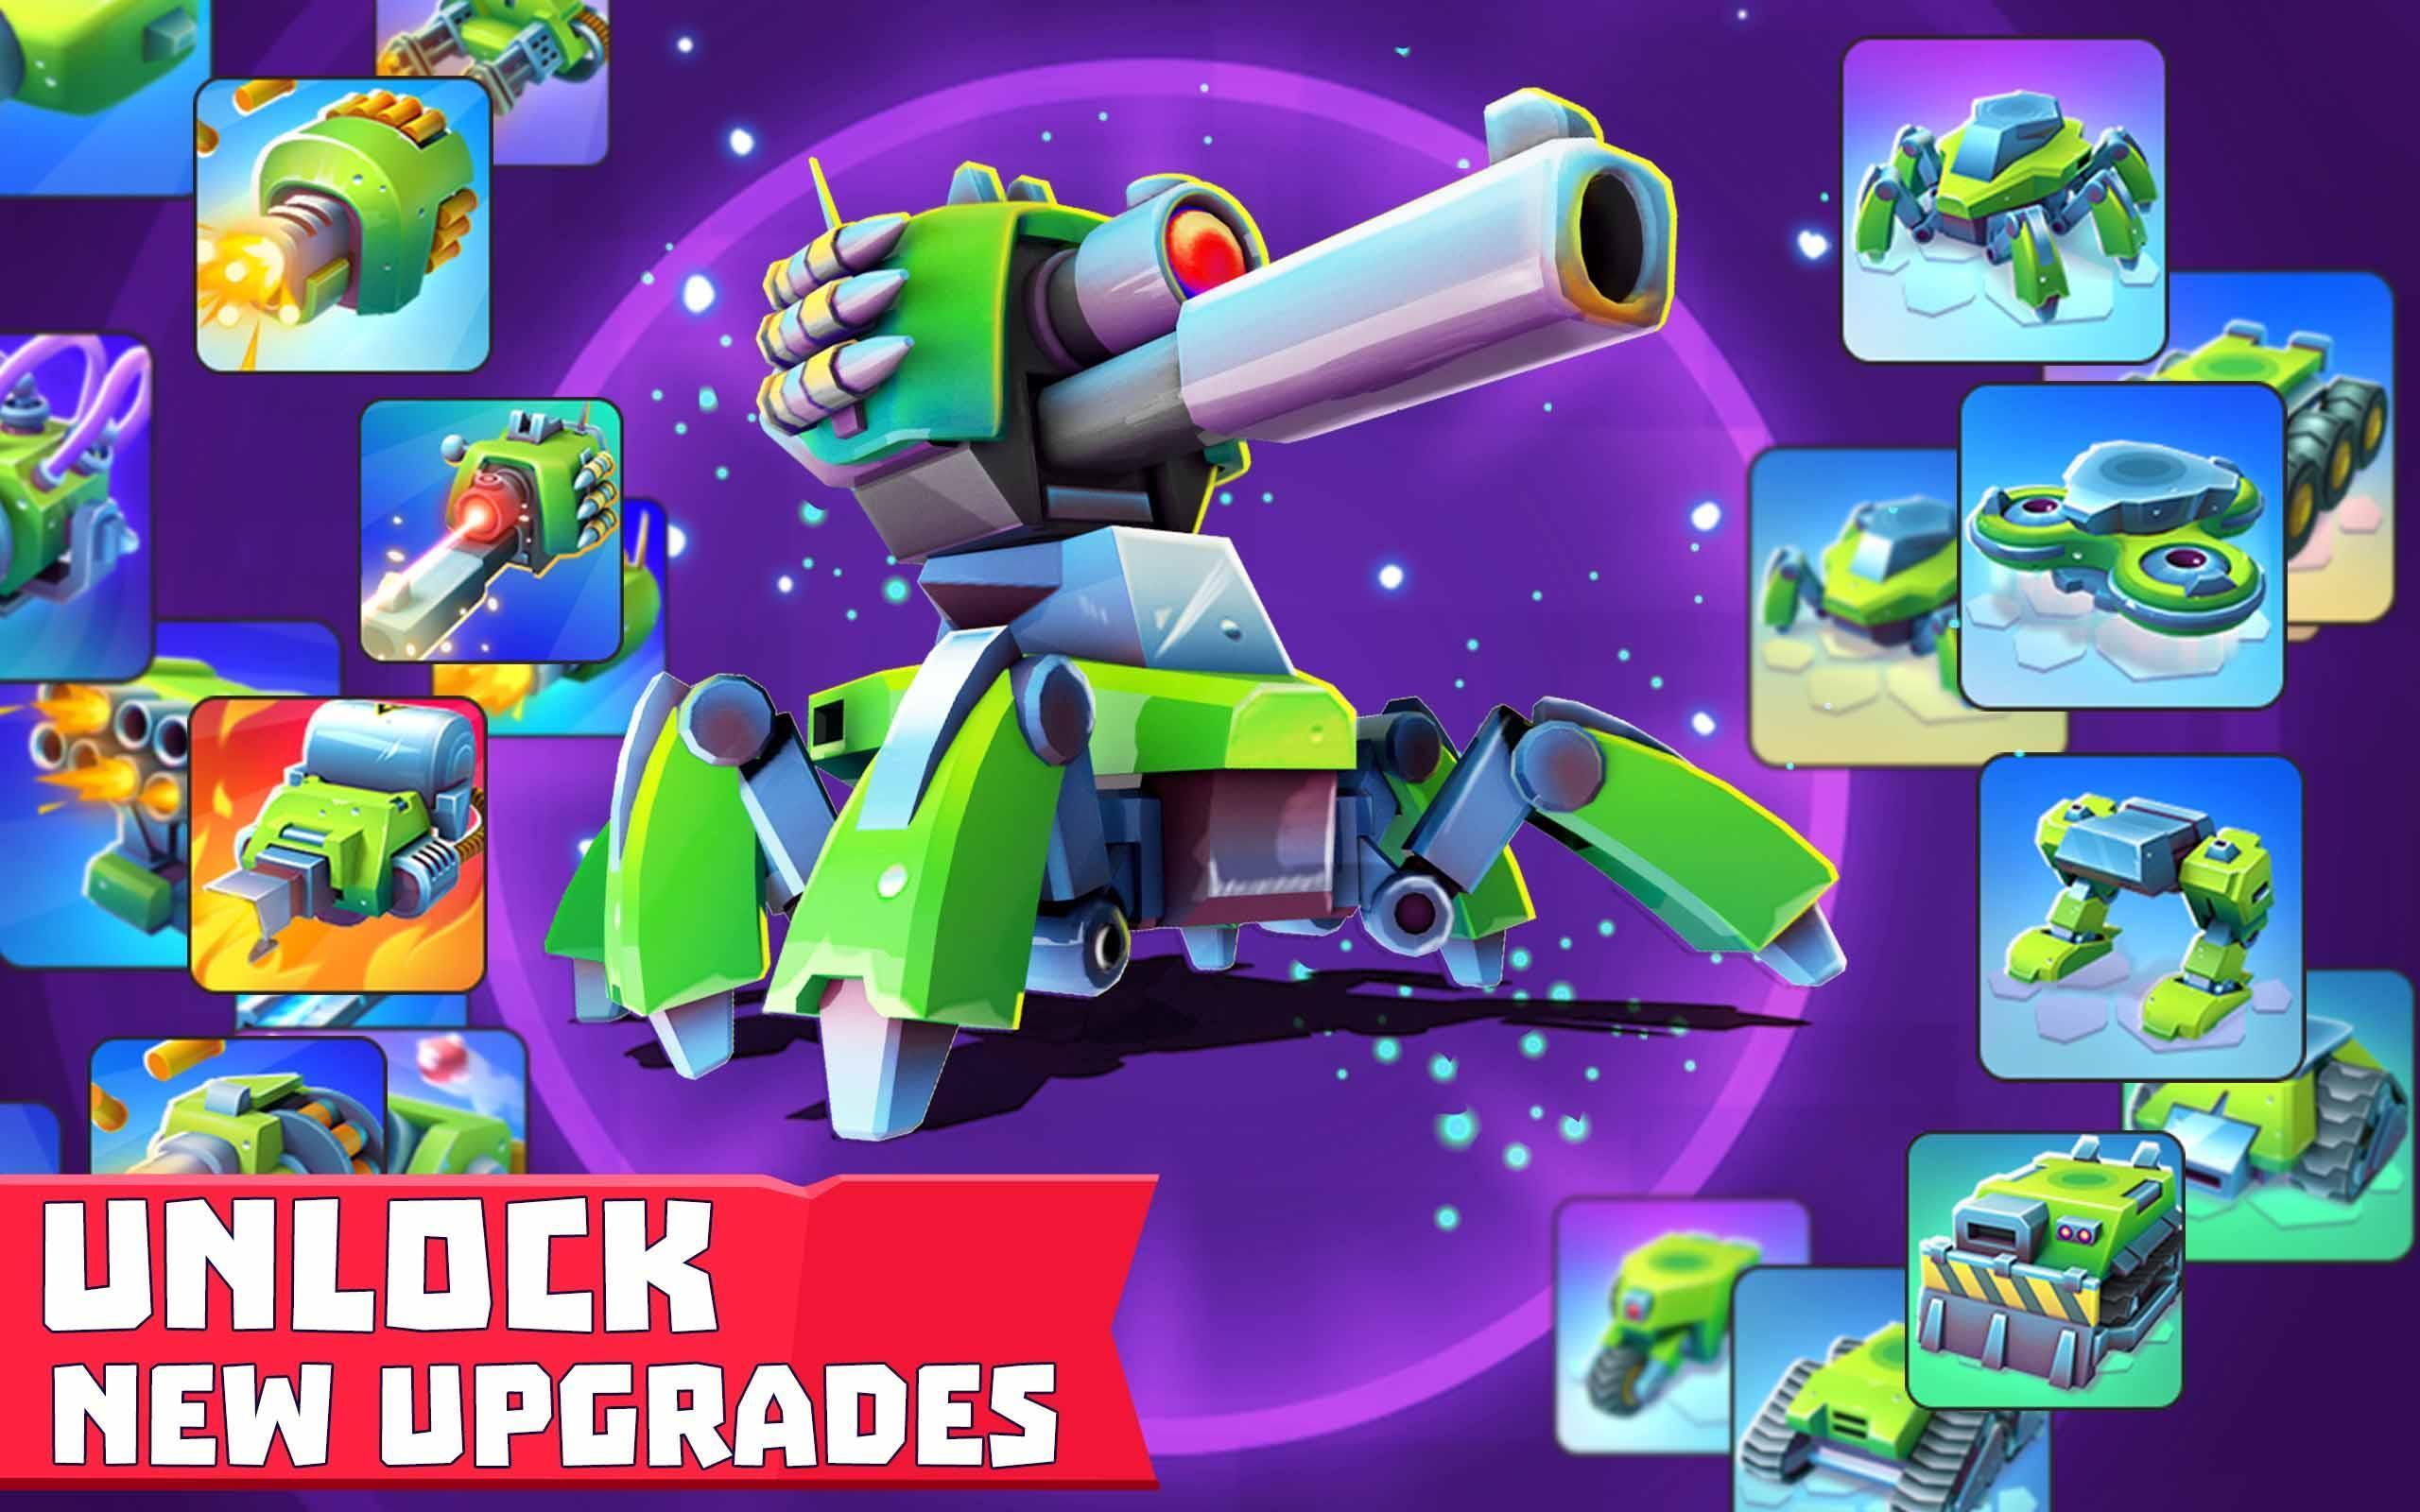 Tanks A Lot! - Realtime Multiplayer Battle Arena 2.56 Screenshot 20